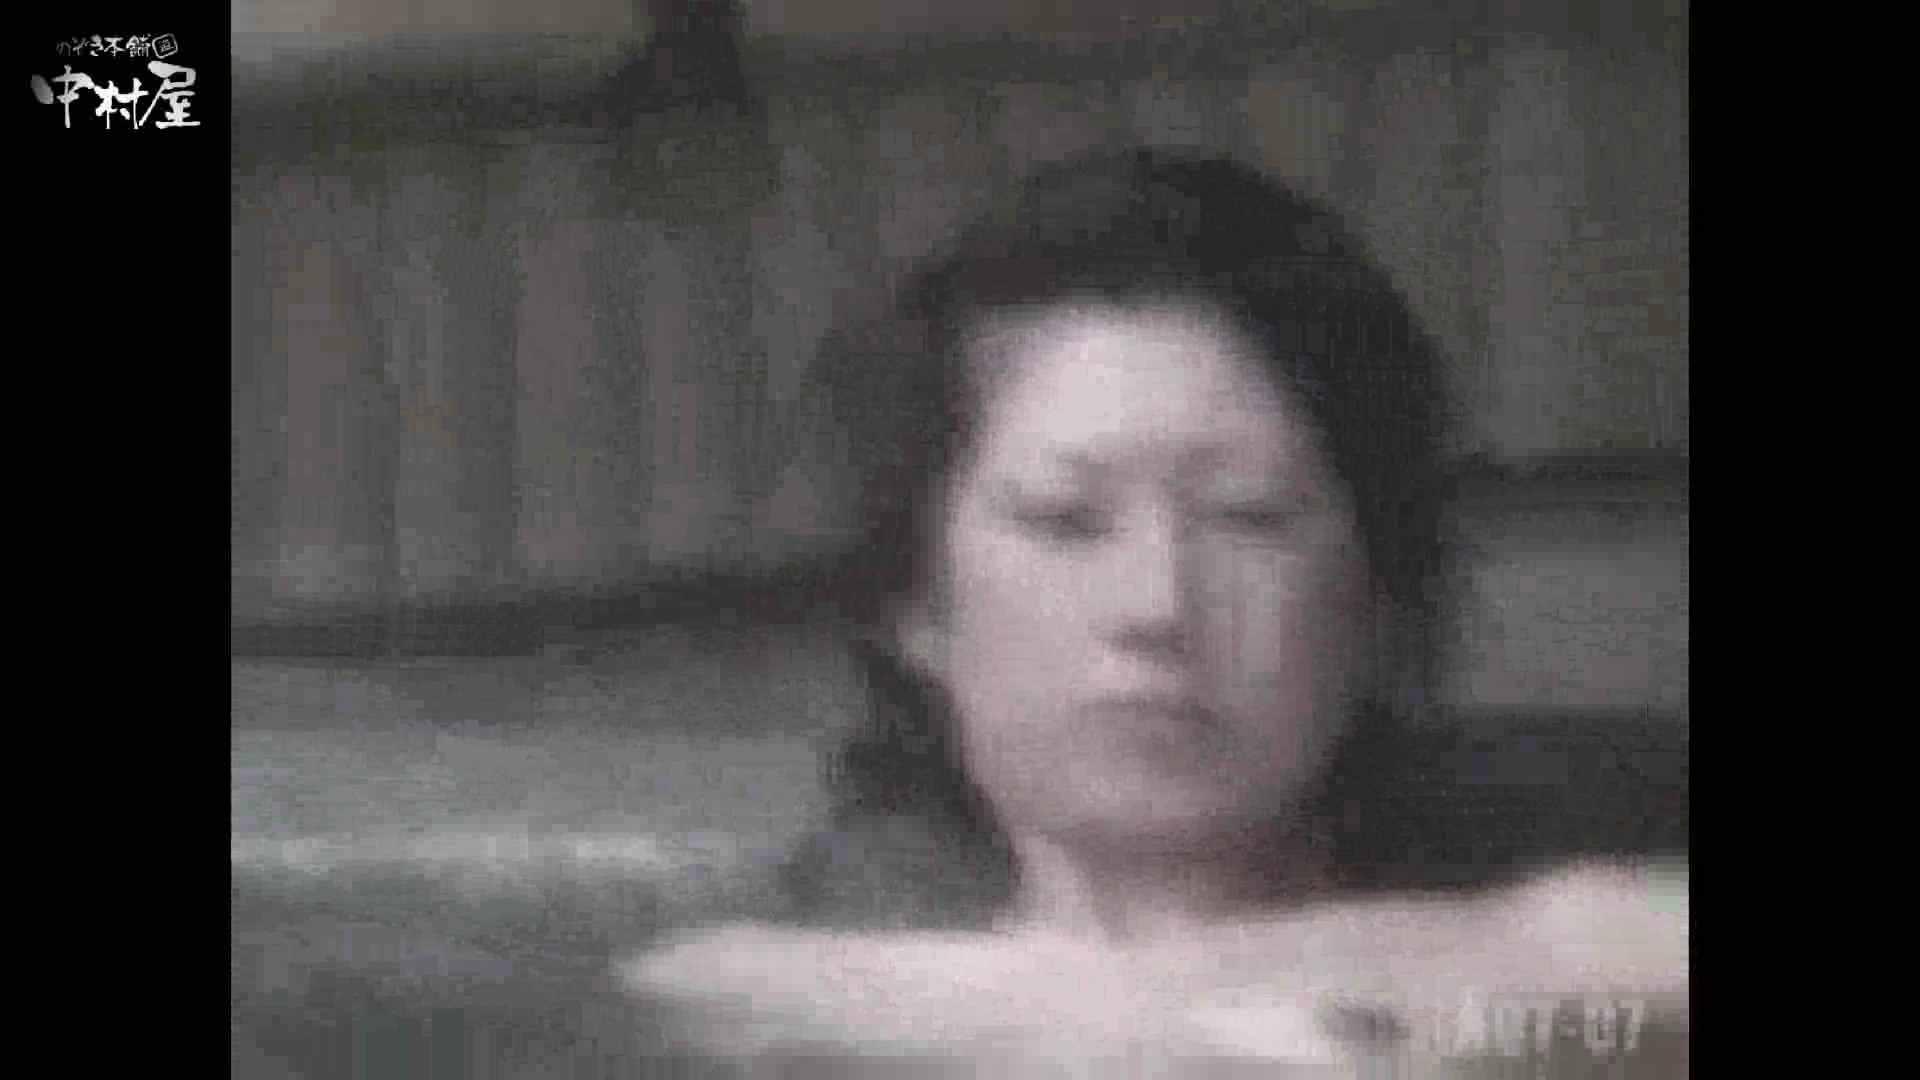 Aquaな露天風呂Vol.871潜入盗撮露天風呂七判湯 其の三 OLエロ画像  70PICs 12